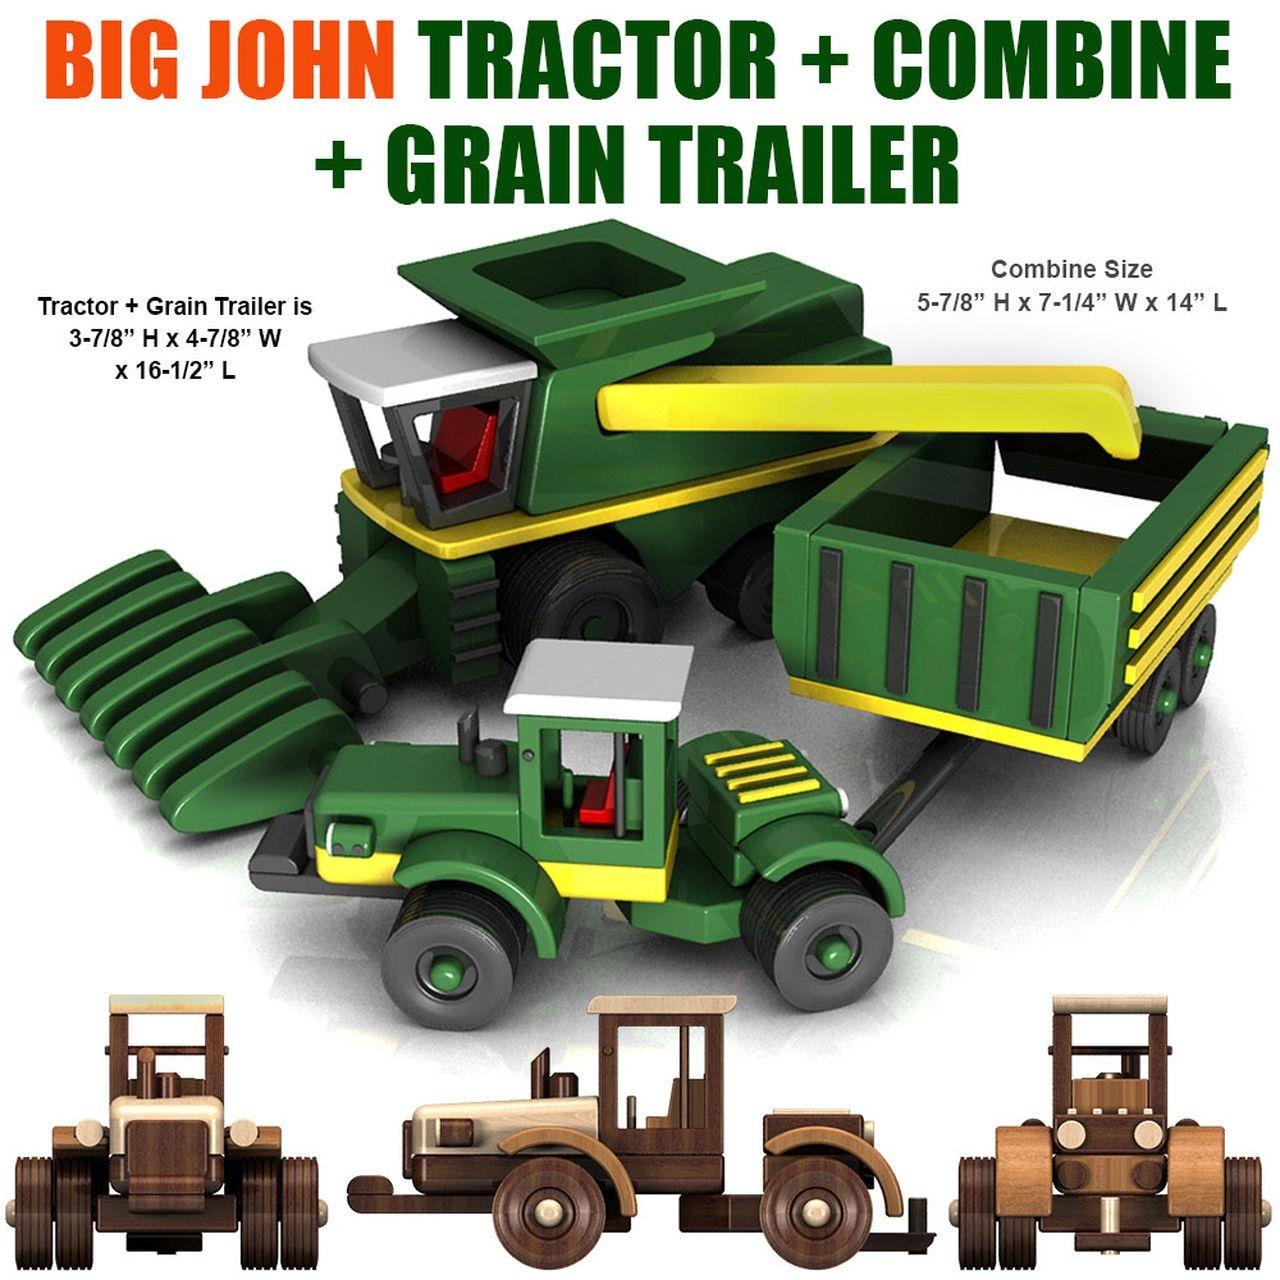 Big john farm tractor trailer combine wood toy plans